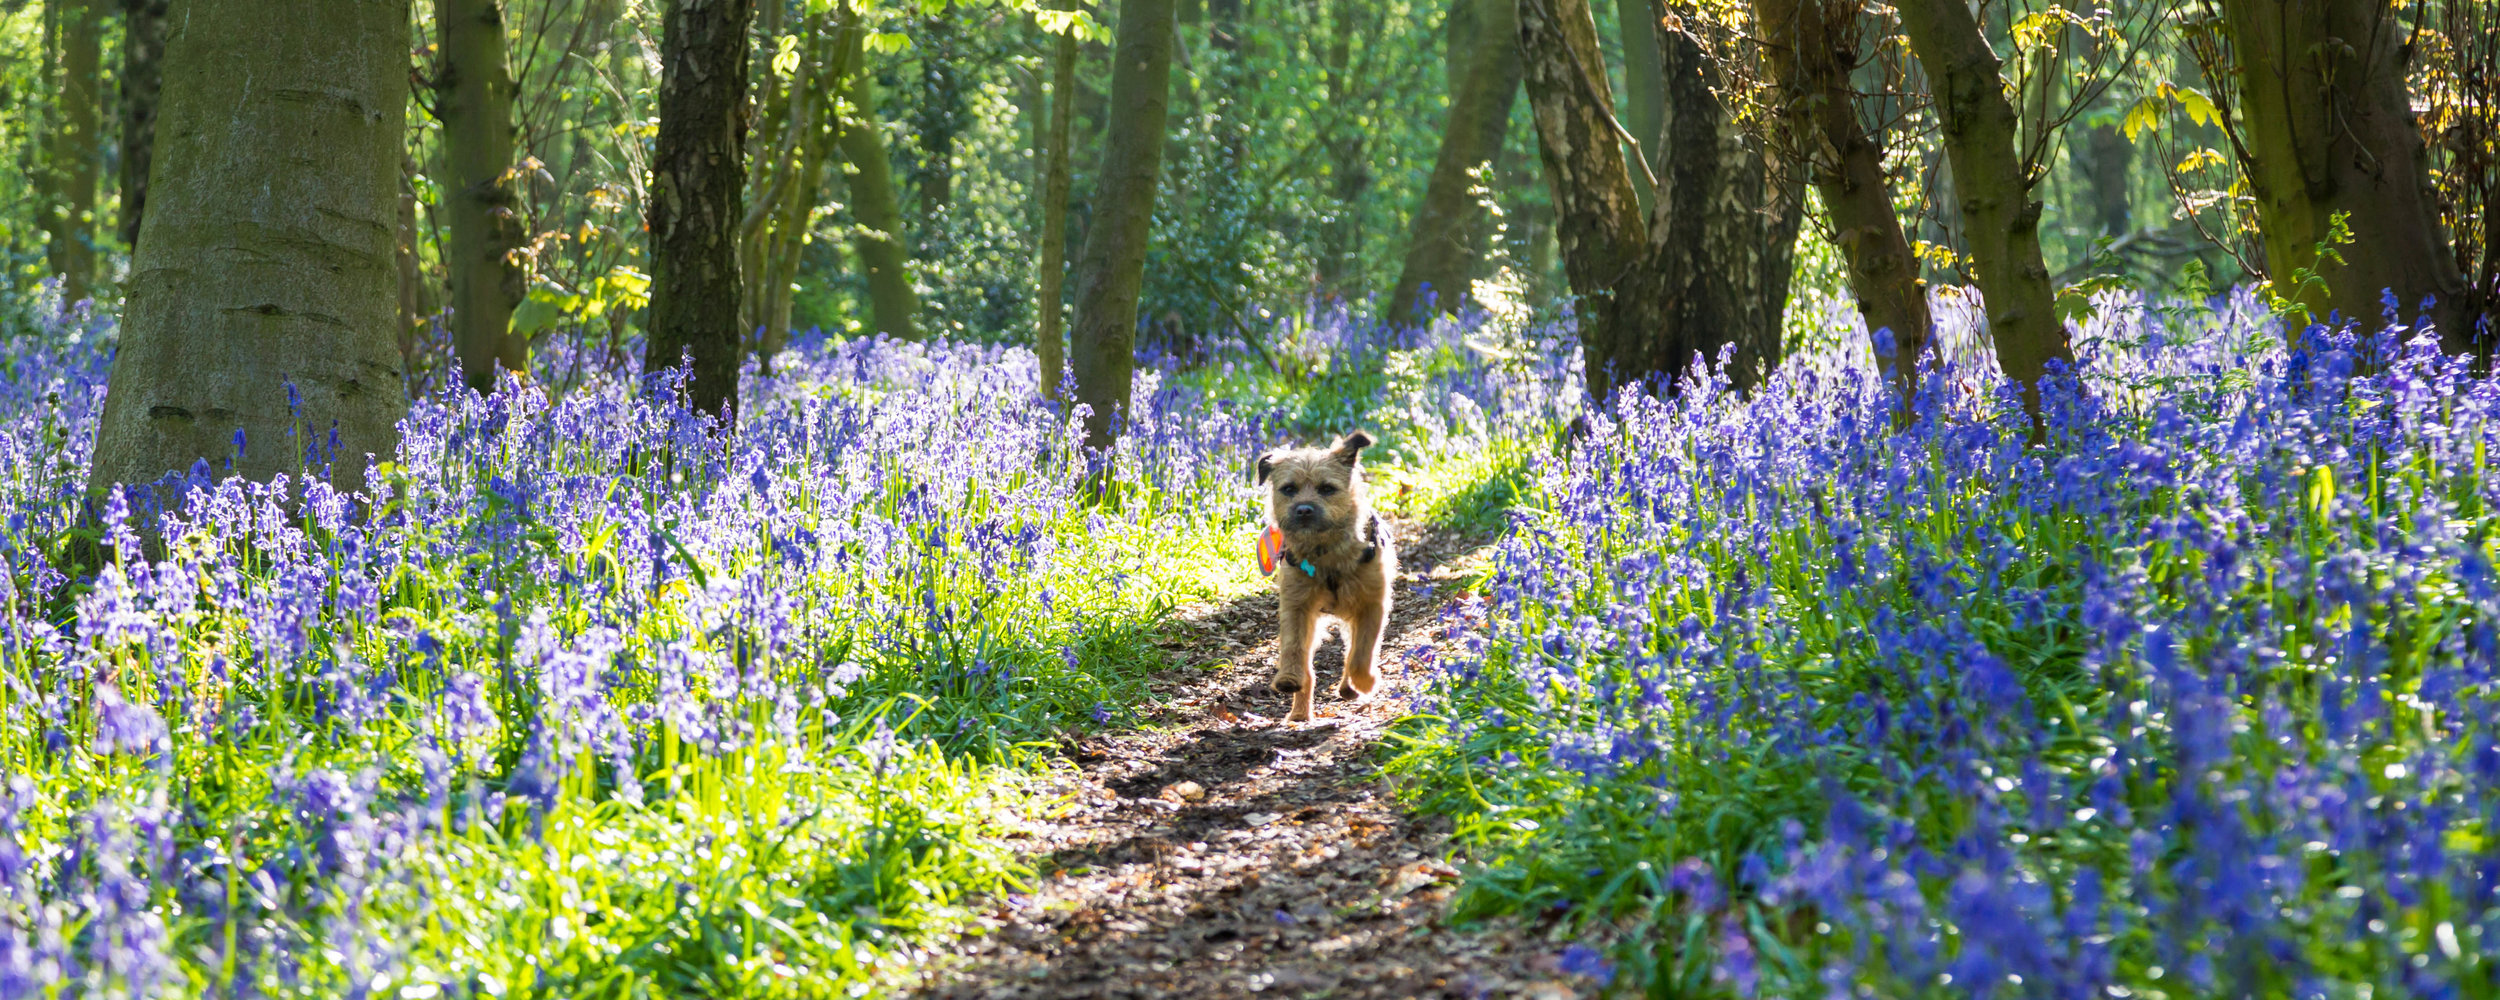 Pickle, Team Verve's Border Terrier giving his seal of approval to the Bluebells in Oldmoor Wood, Nottinghamshire. Image: Chris Denning, Verve Garden Design